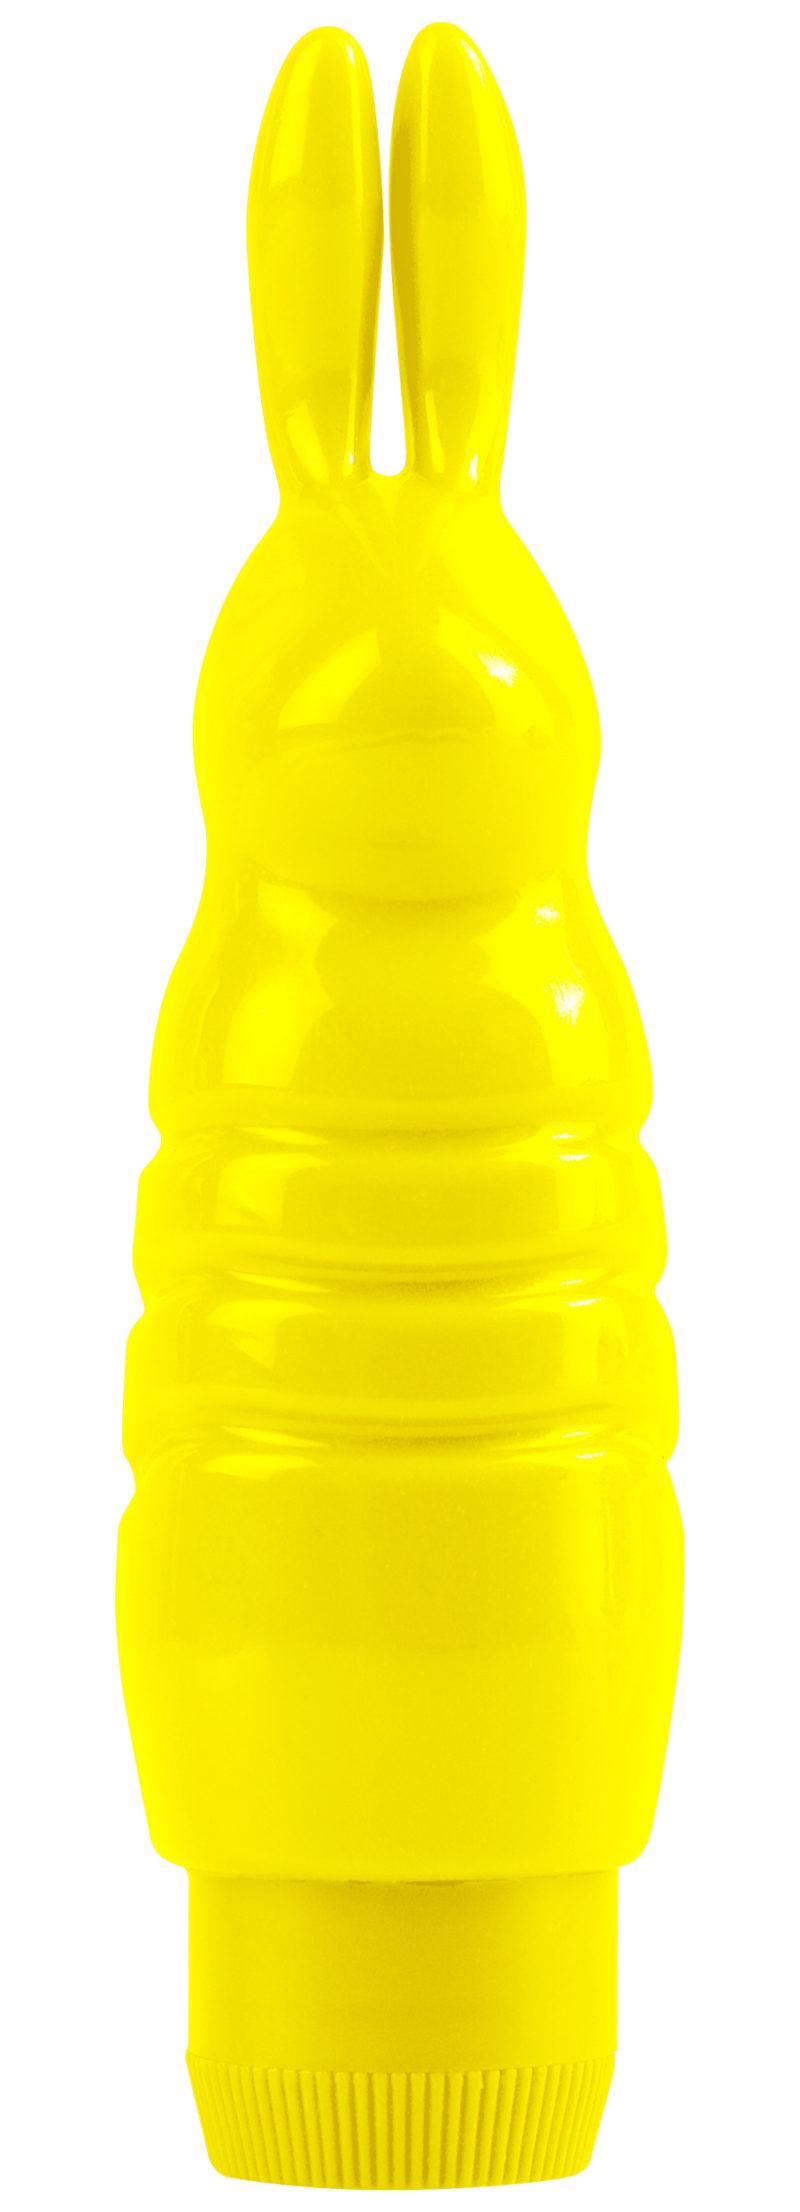 Pipedream Neon Luv Touch Lil Rabbit Vibrator